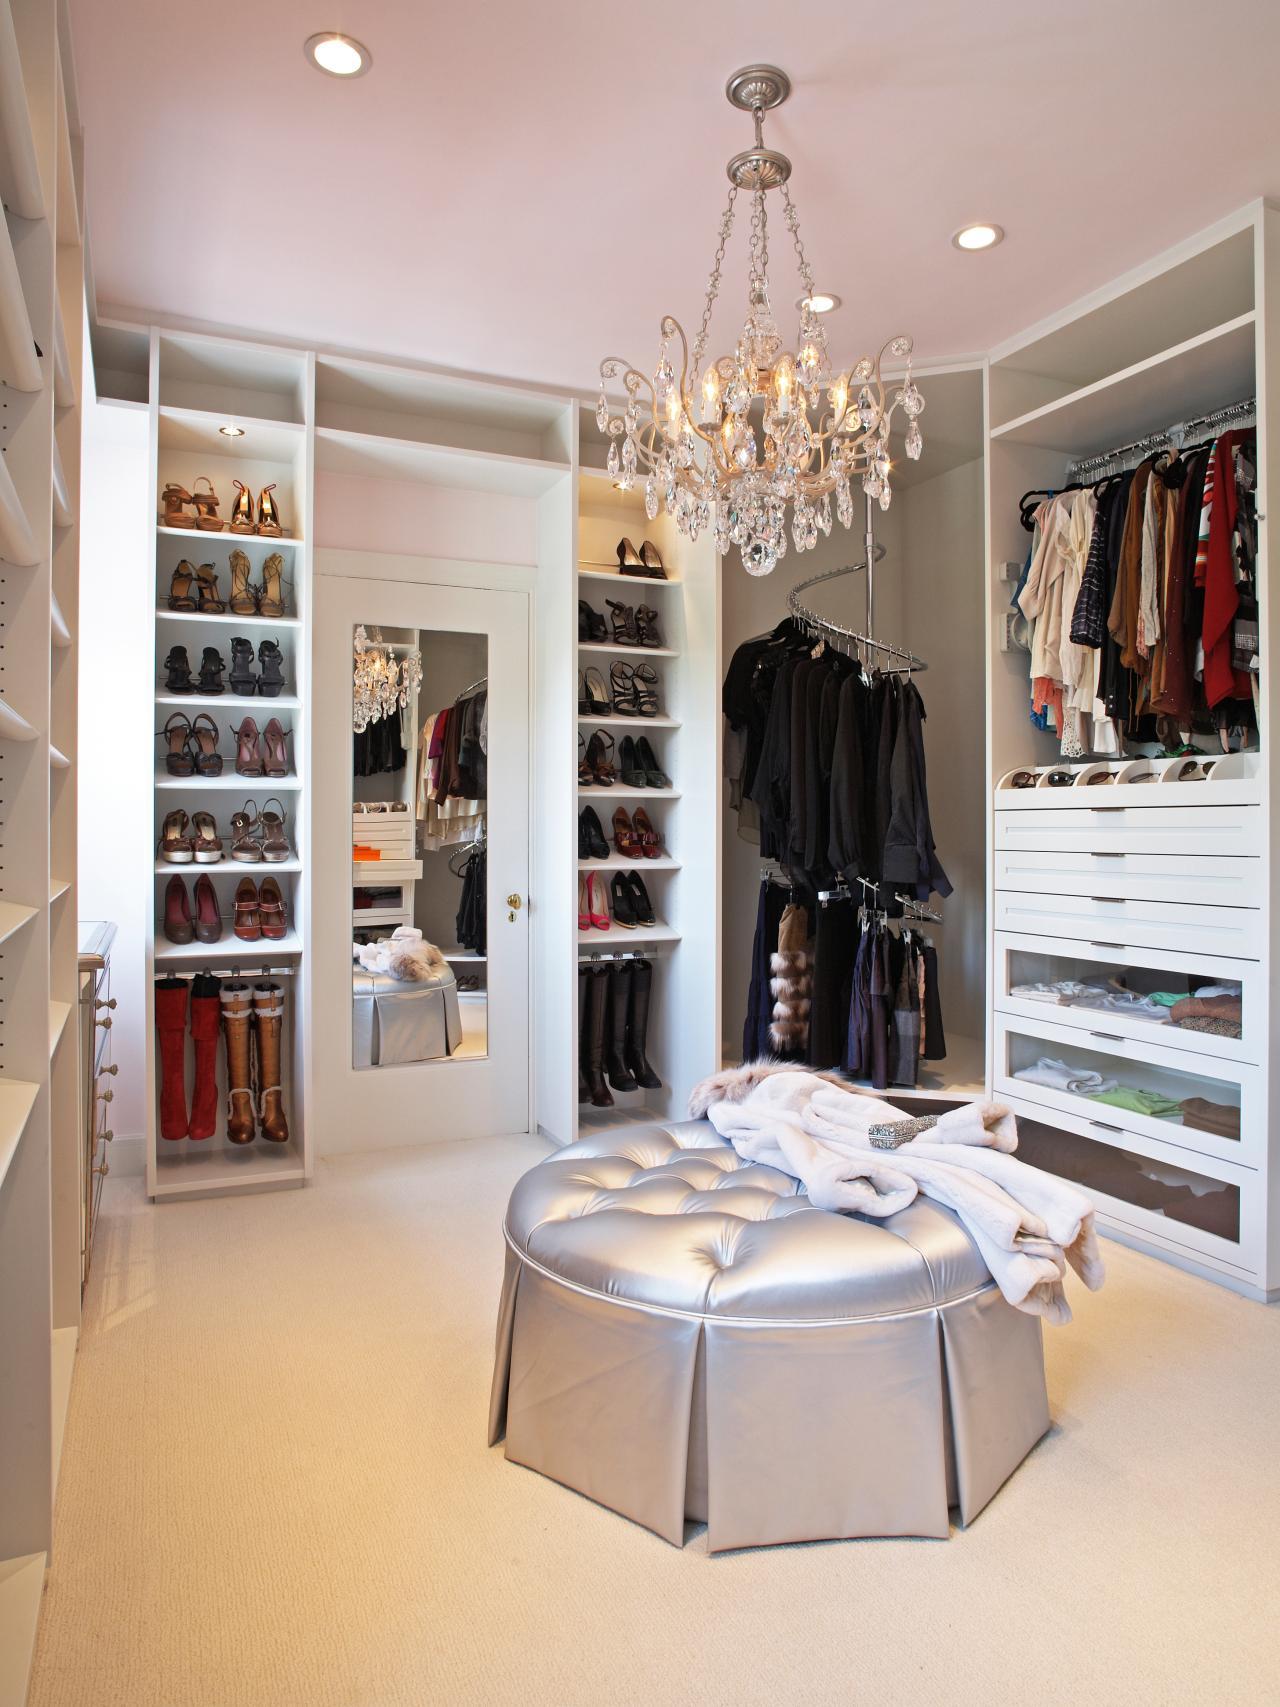 Walk In Closet In All Its Glory Interior Design Paradise